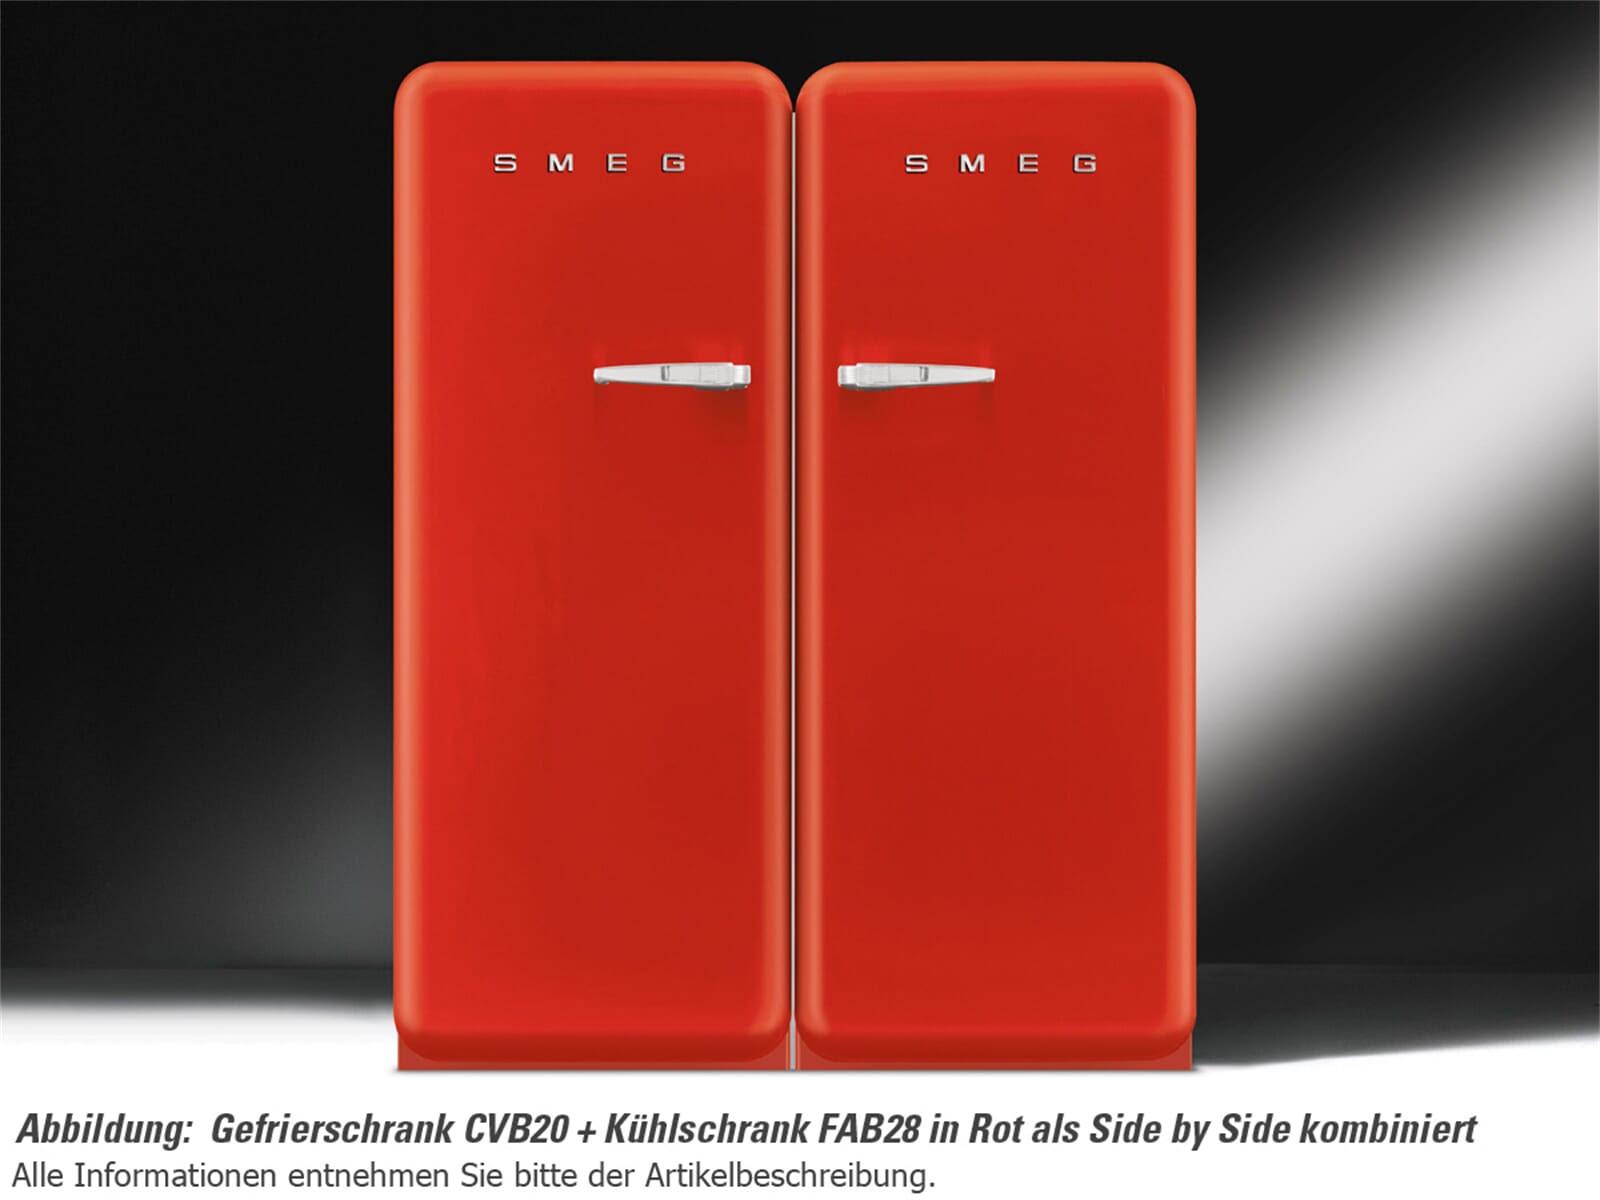 Amerikanischer Kühlschrank Vintage : Amerikanischer kühlschrank rot hashimoto kimberly